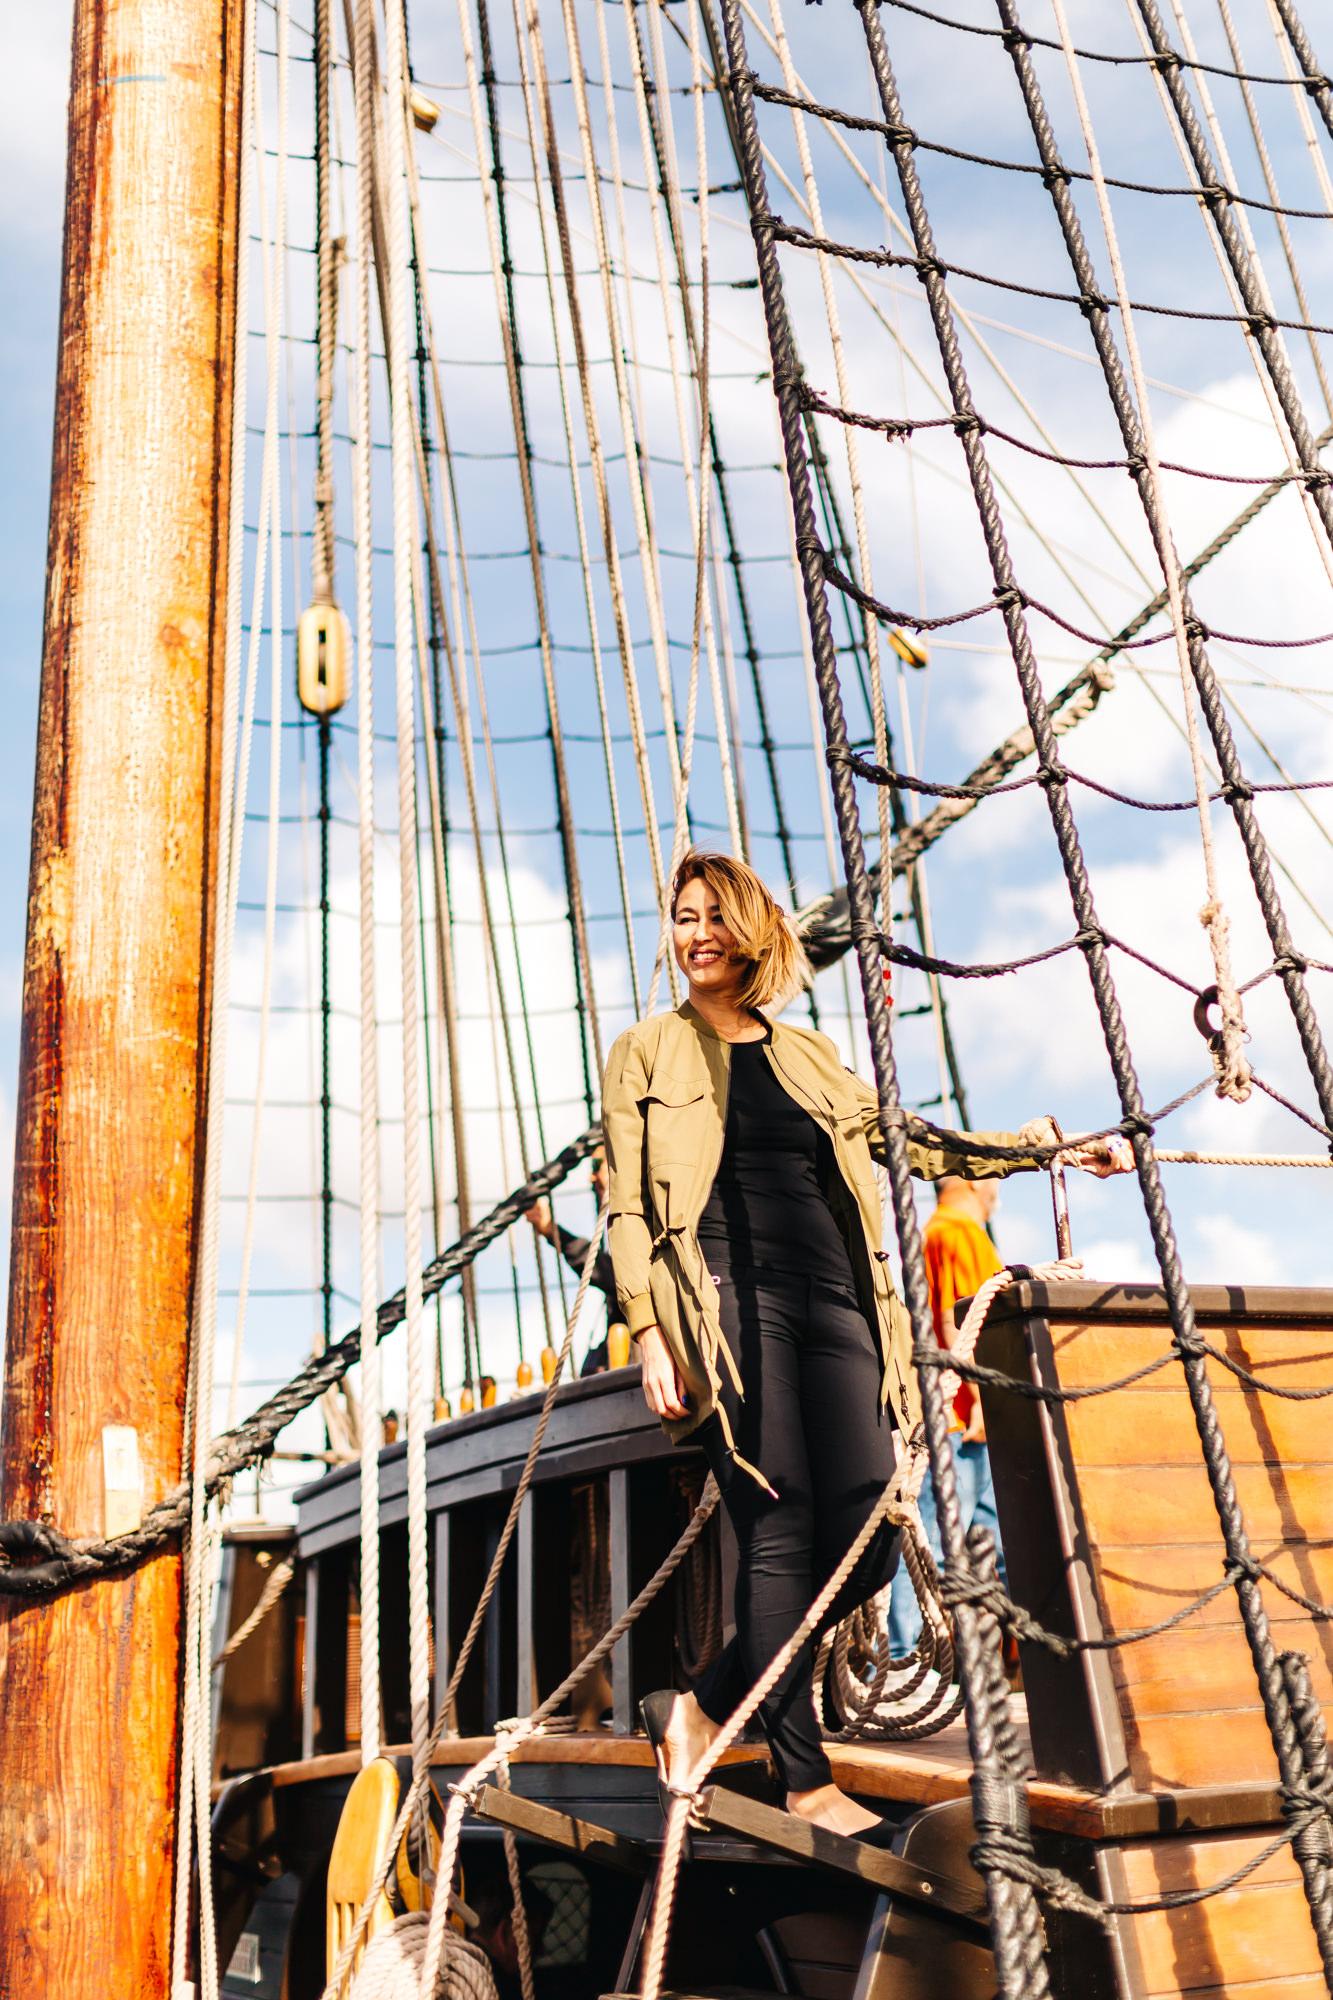 Maritime Museum San Diego #SanSalvador #ship #pirateship #SanDiego